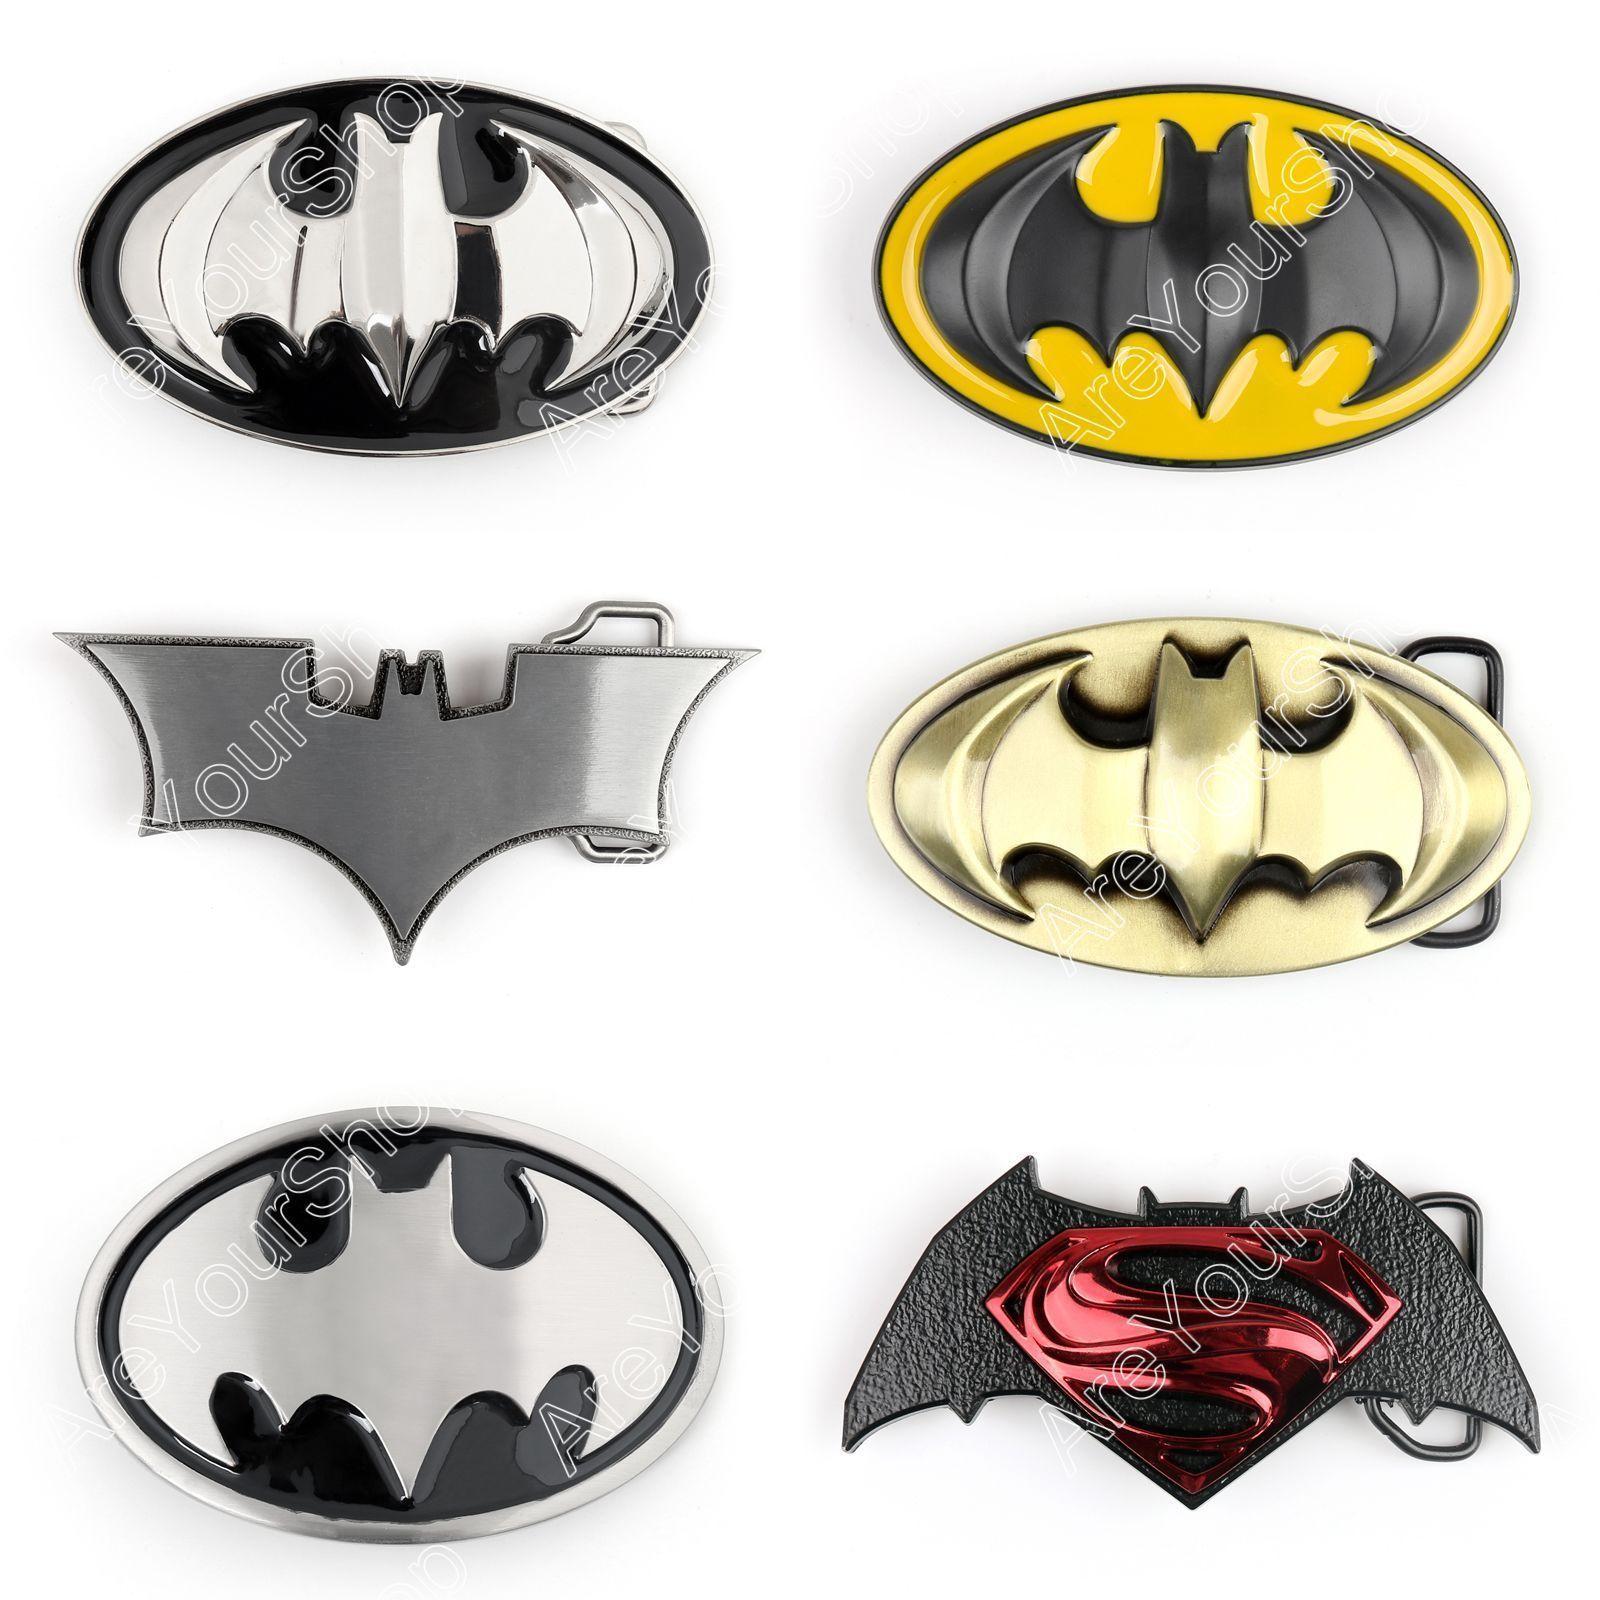 New DC Comics The Joker Superhero Mens Metal Belt Buckle Costume Gift